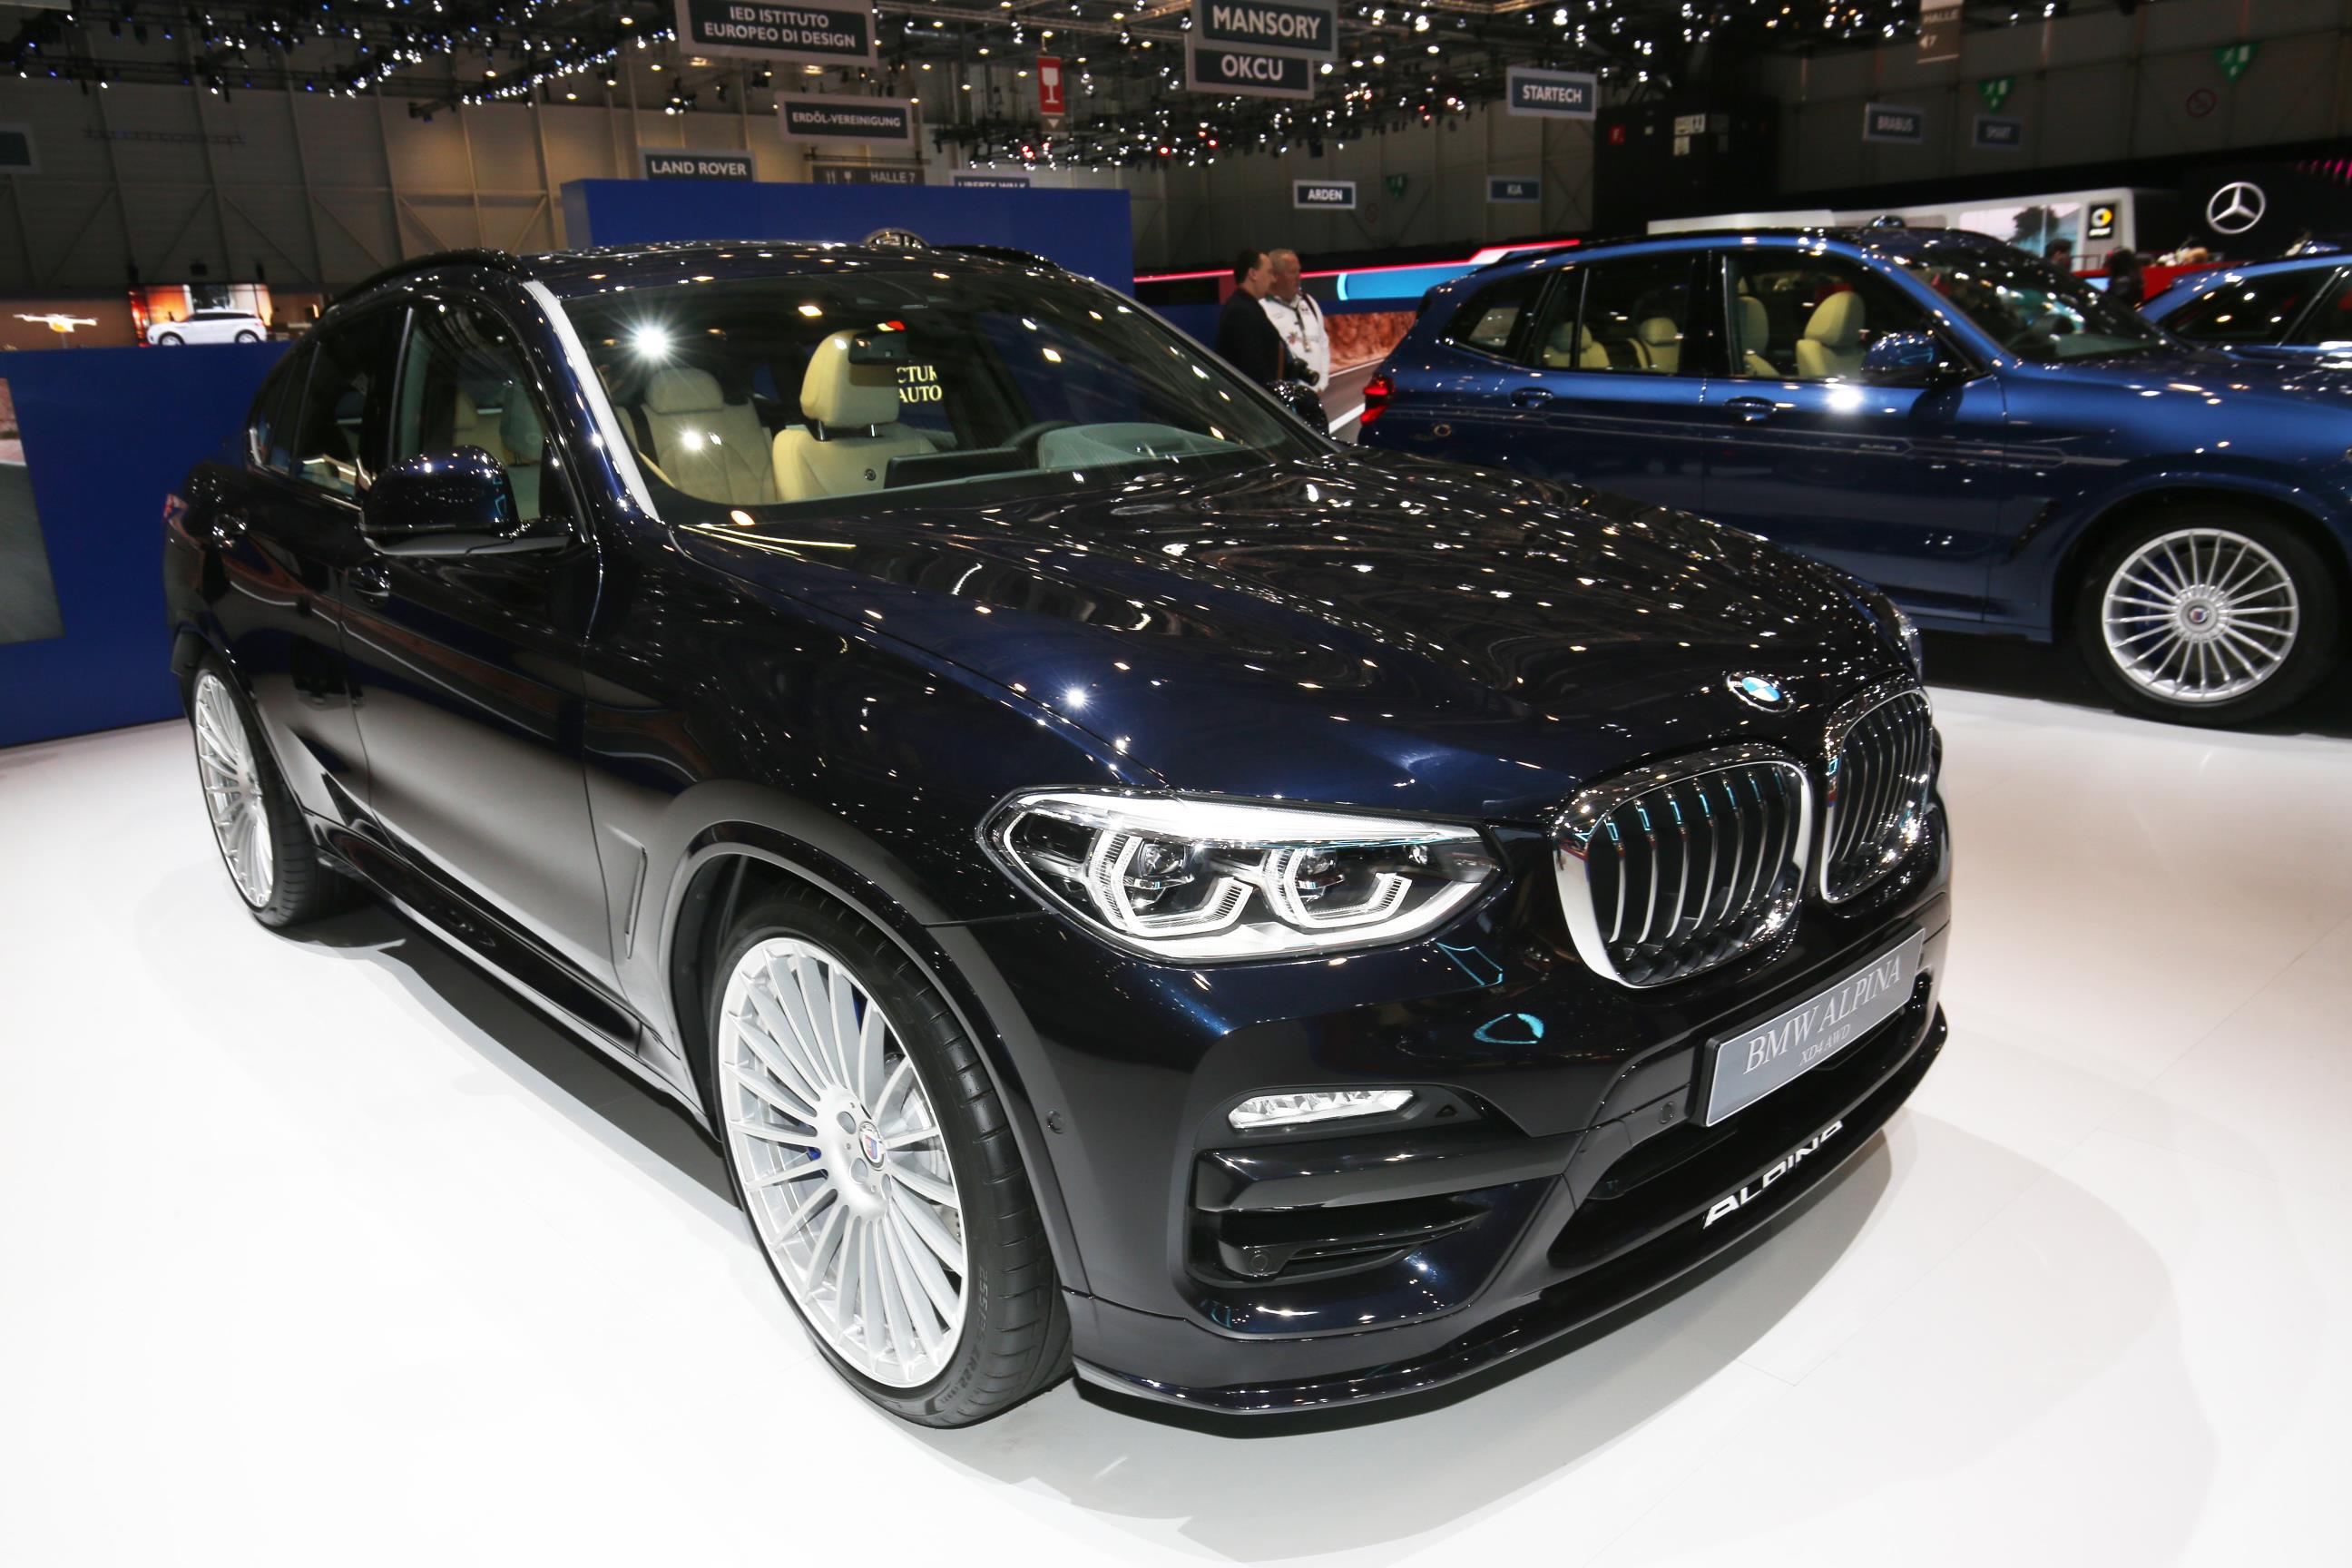 Geneva Motor Show 2018 Mega Gallery Part 2 (276)